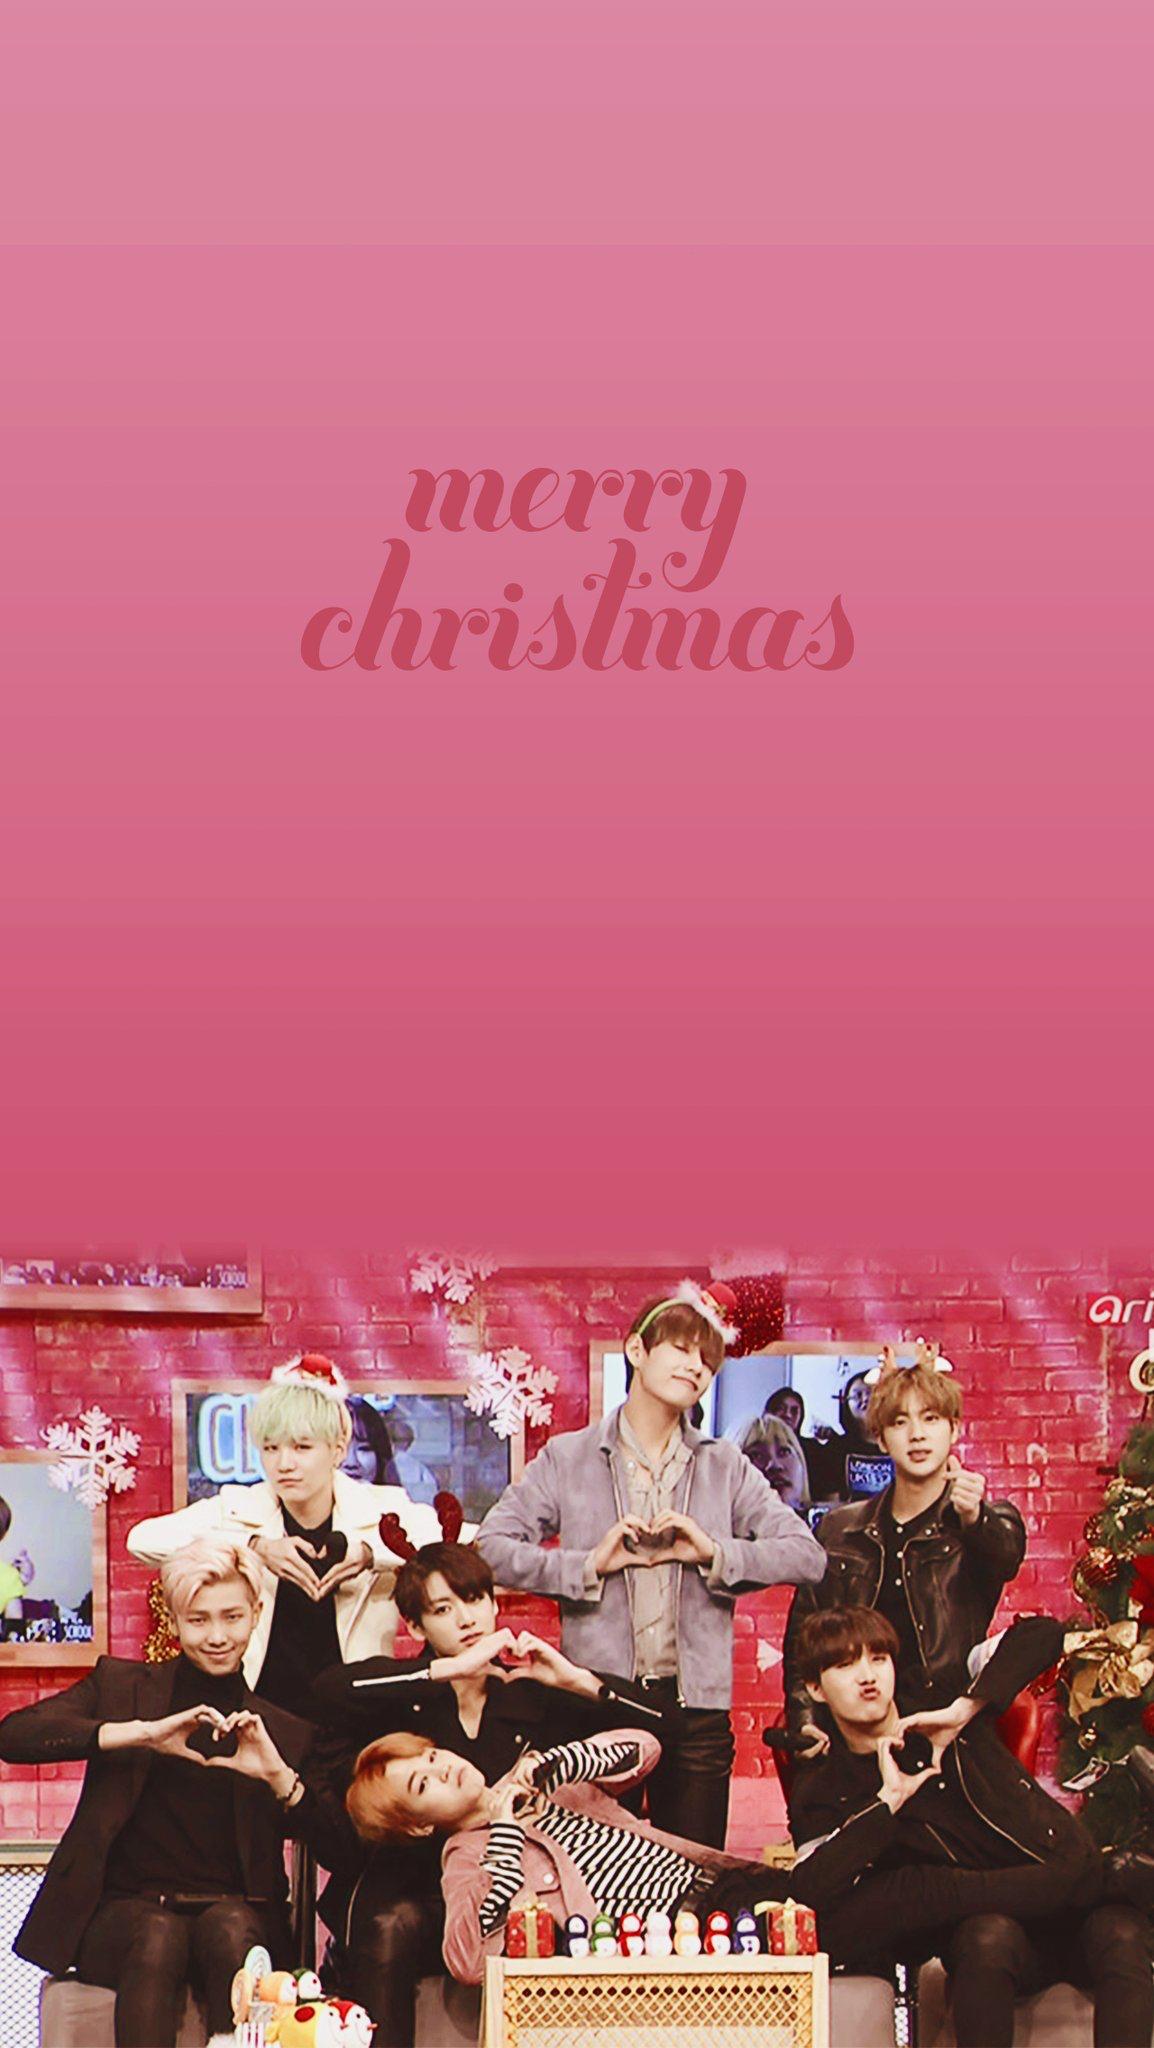 Bts Wallpaper Kpop Wallpapers Bts Wallpaper Bts Bts Christmas